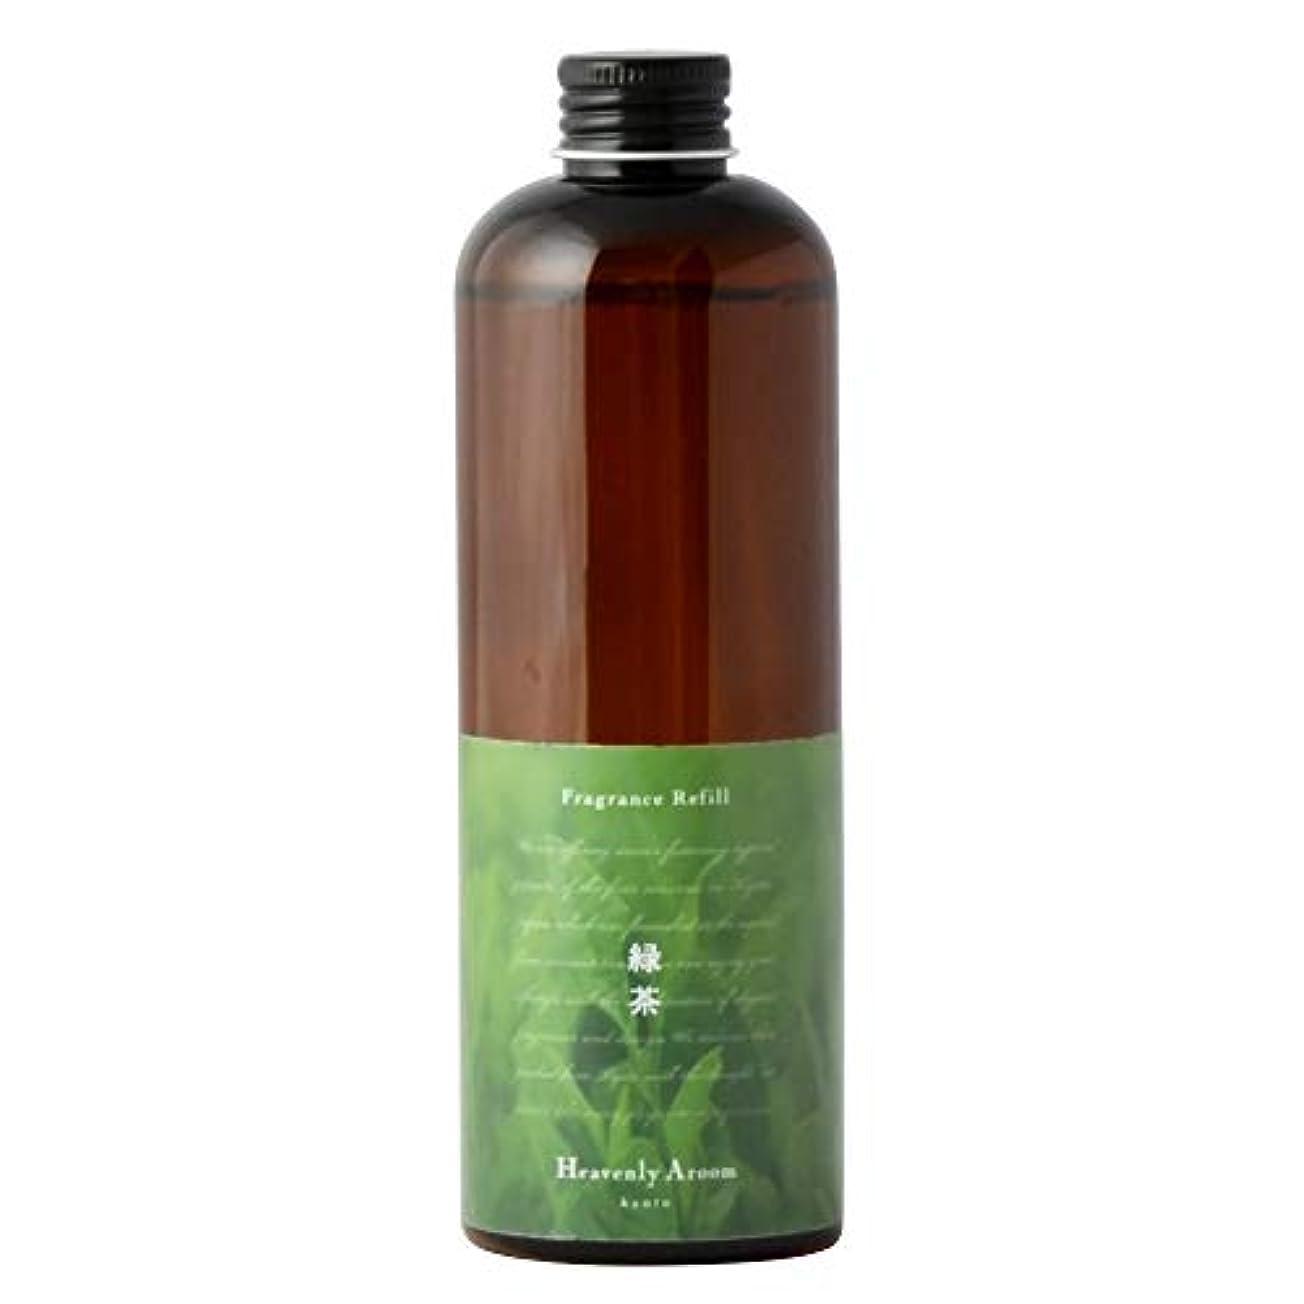 Heavenly Aroomフレグランスリフィル 緑茶 300ml